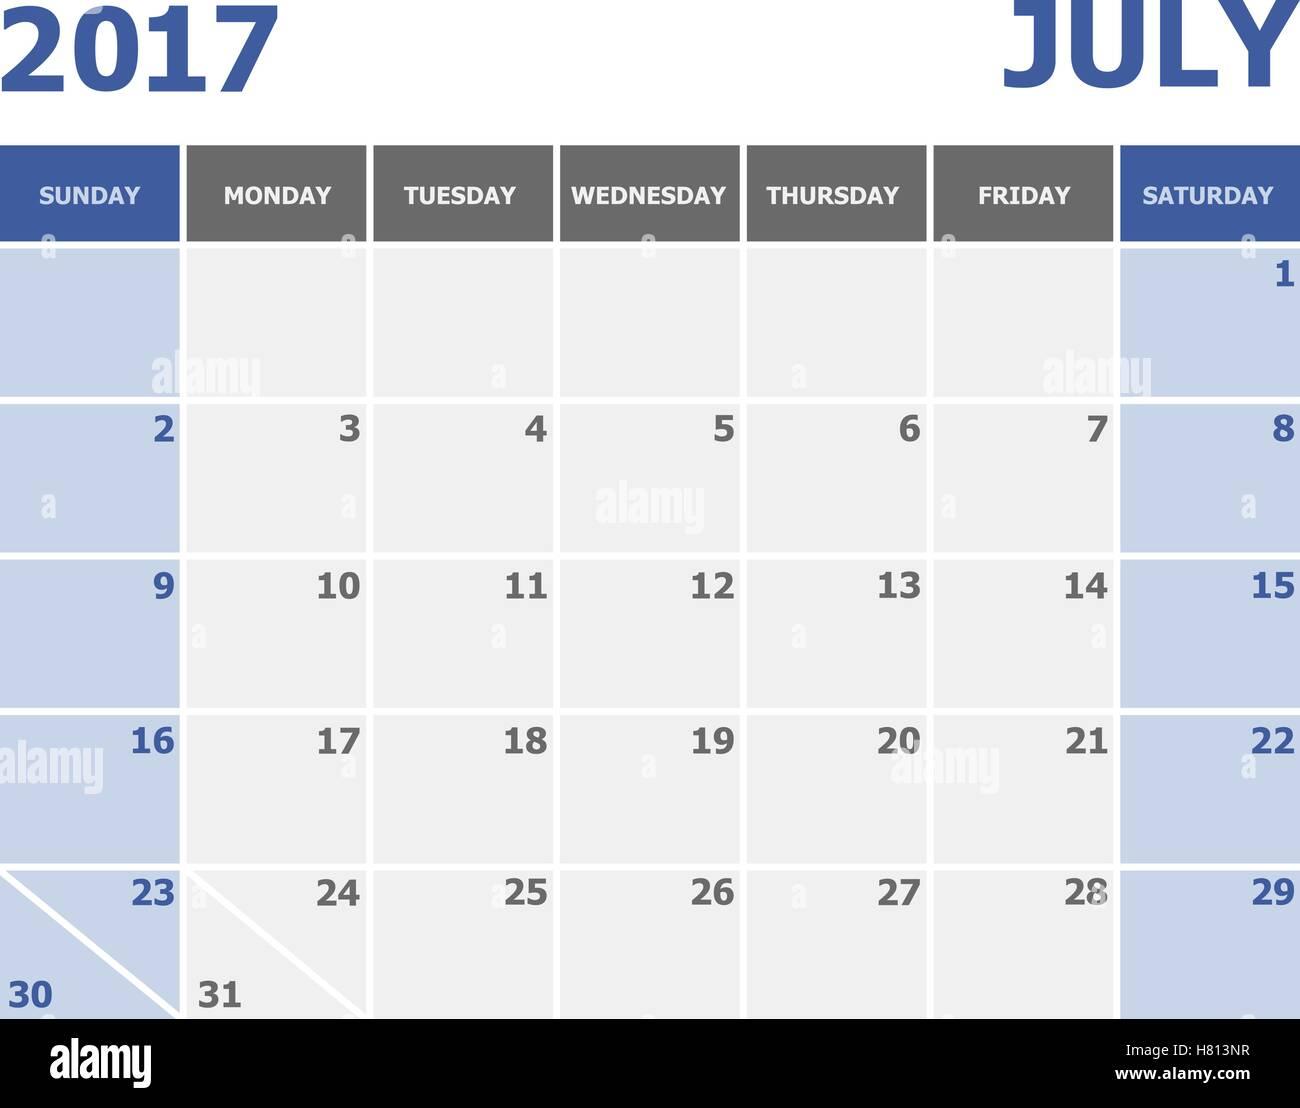 2017 July Calendar Week Starts On Sunday Stock Photos & 2017